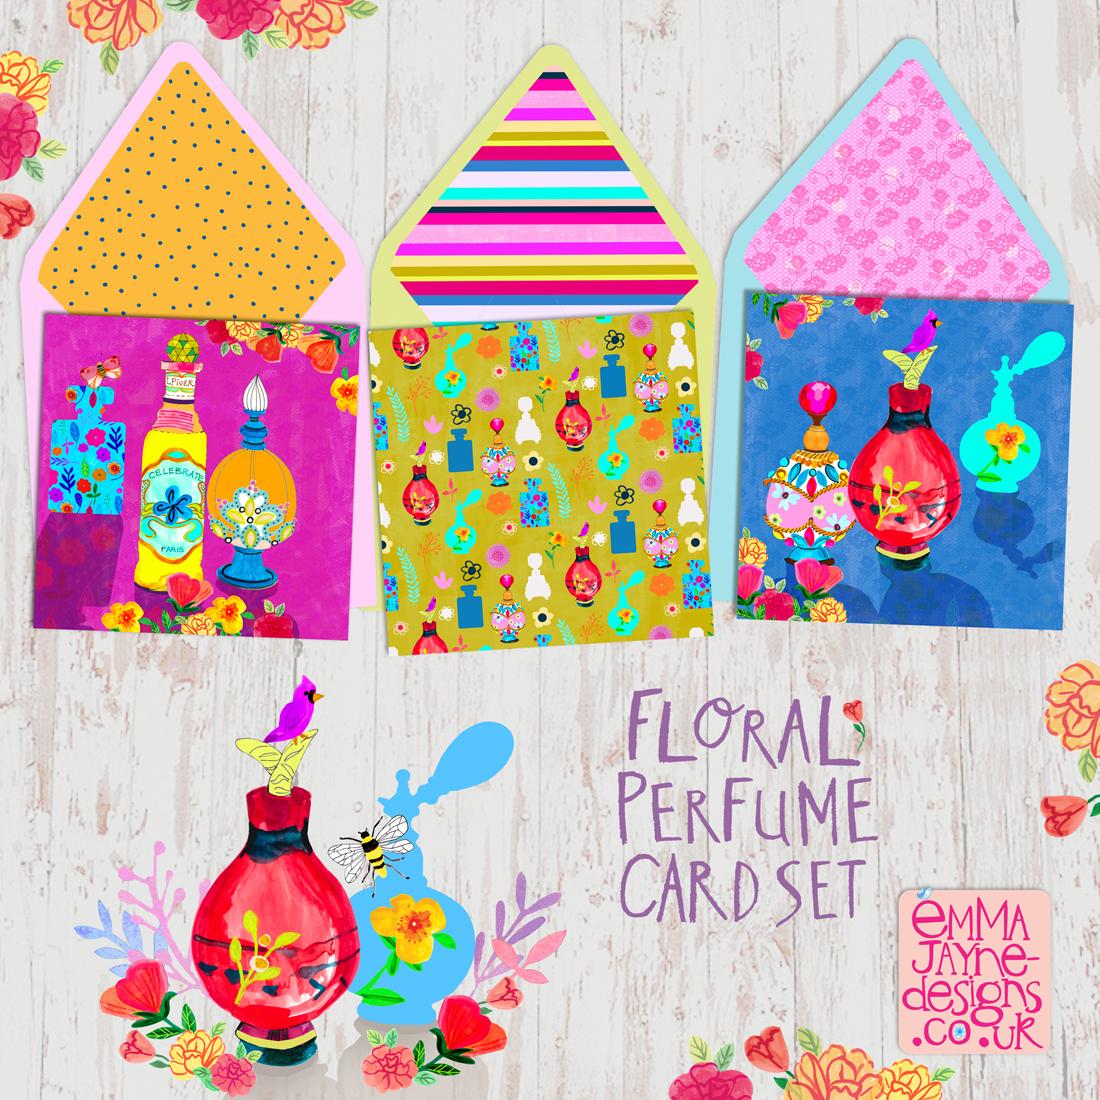 floral-perfume-card-set-emmajayne-designs